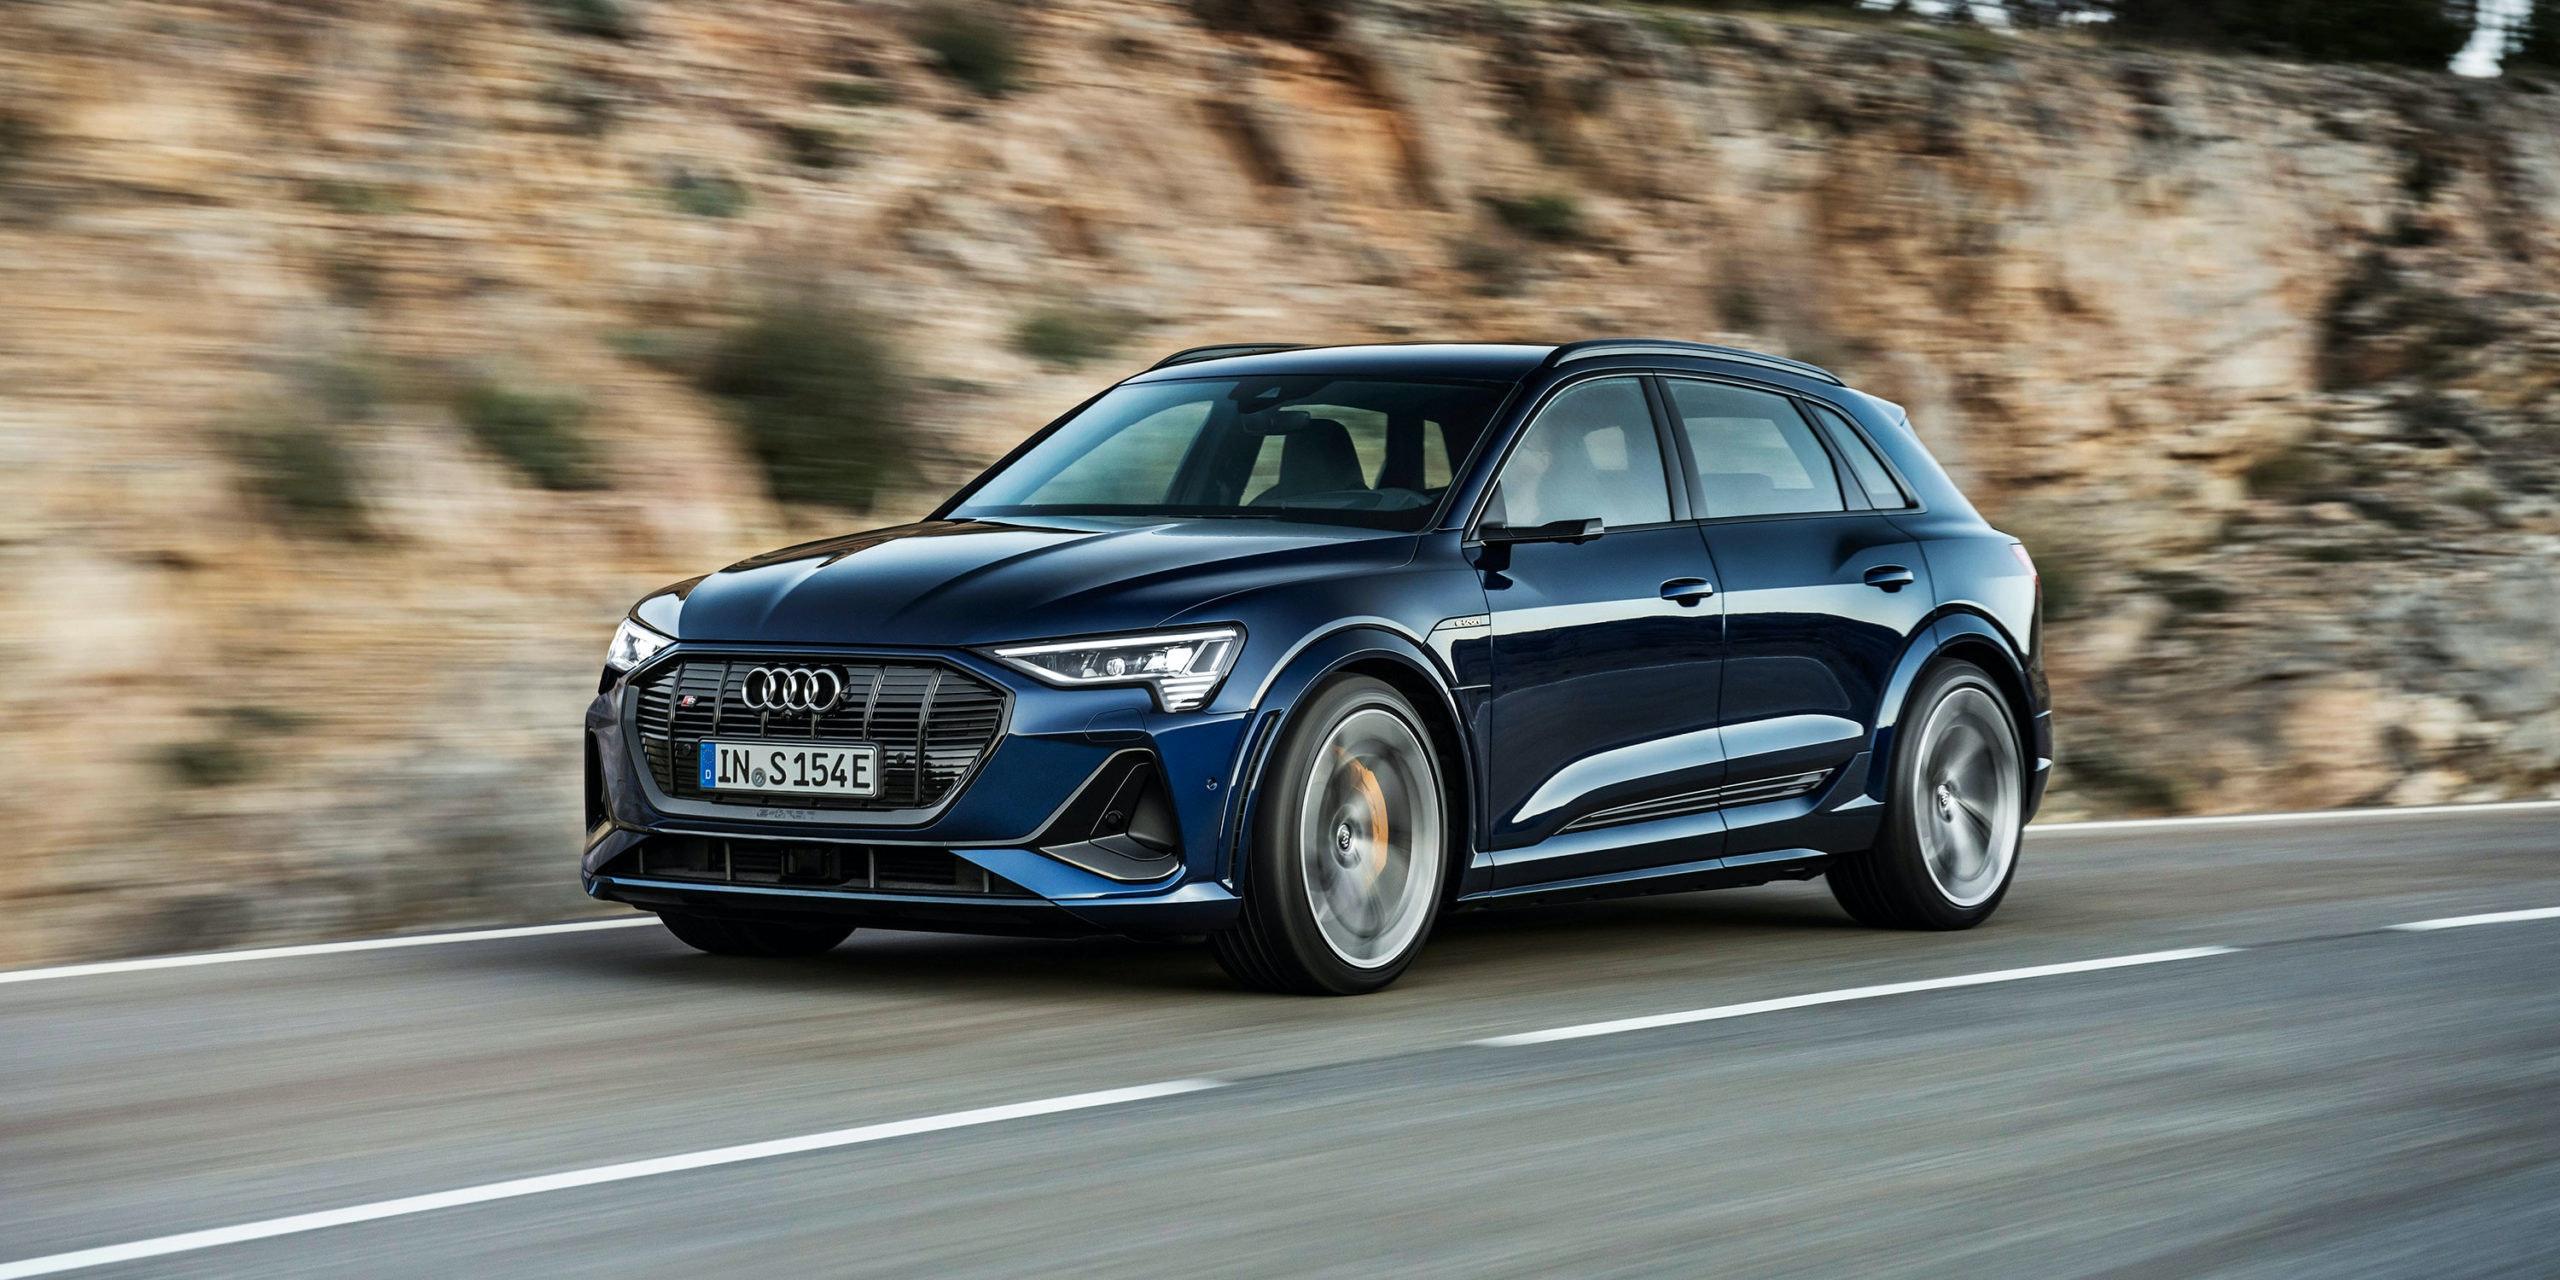 Audi E Tron S Audi E Tron S Sportback Revealed Price Specs And Release Date Carwow